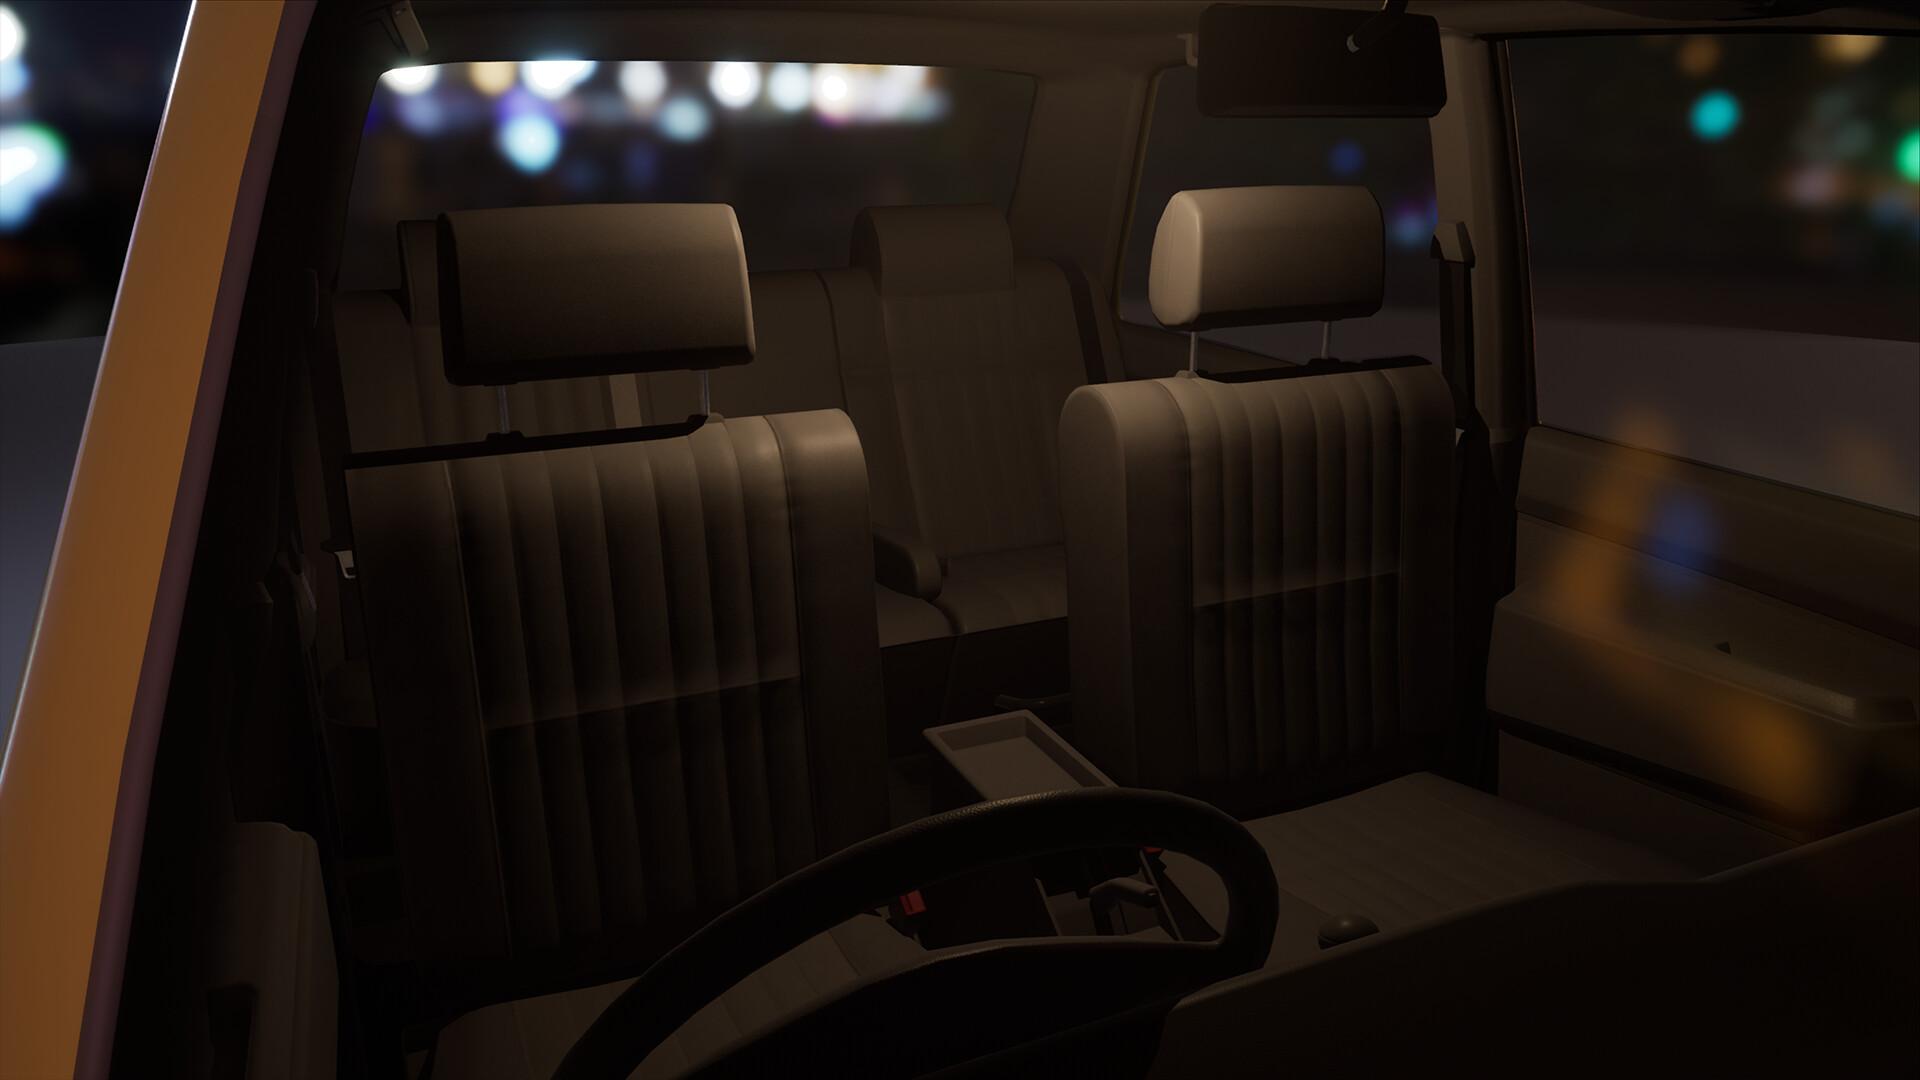 Seats and Interior